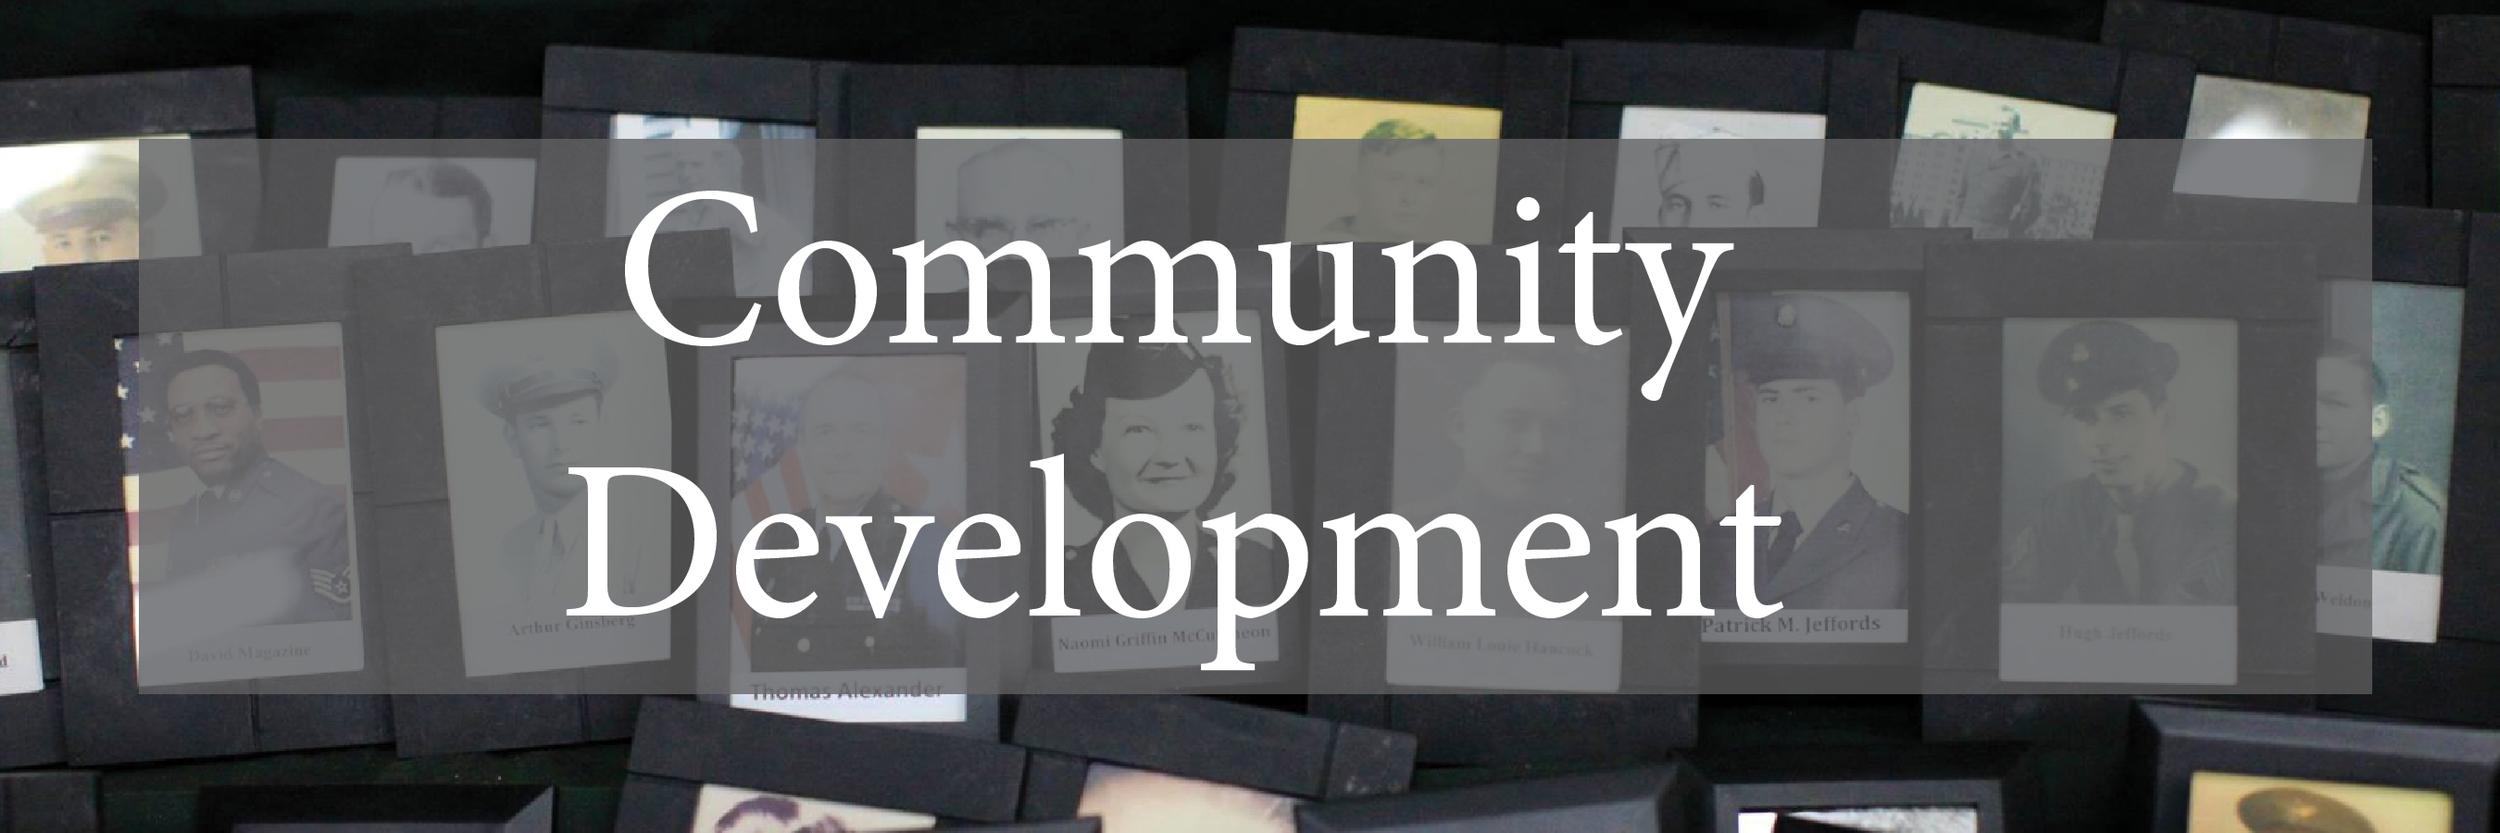 communitydevelopemnt2.jpg